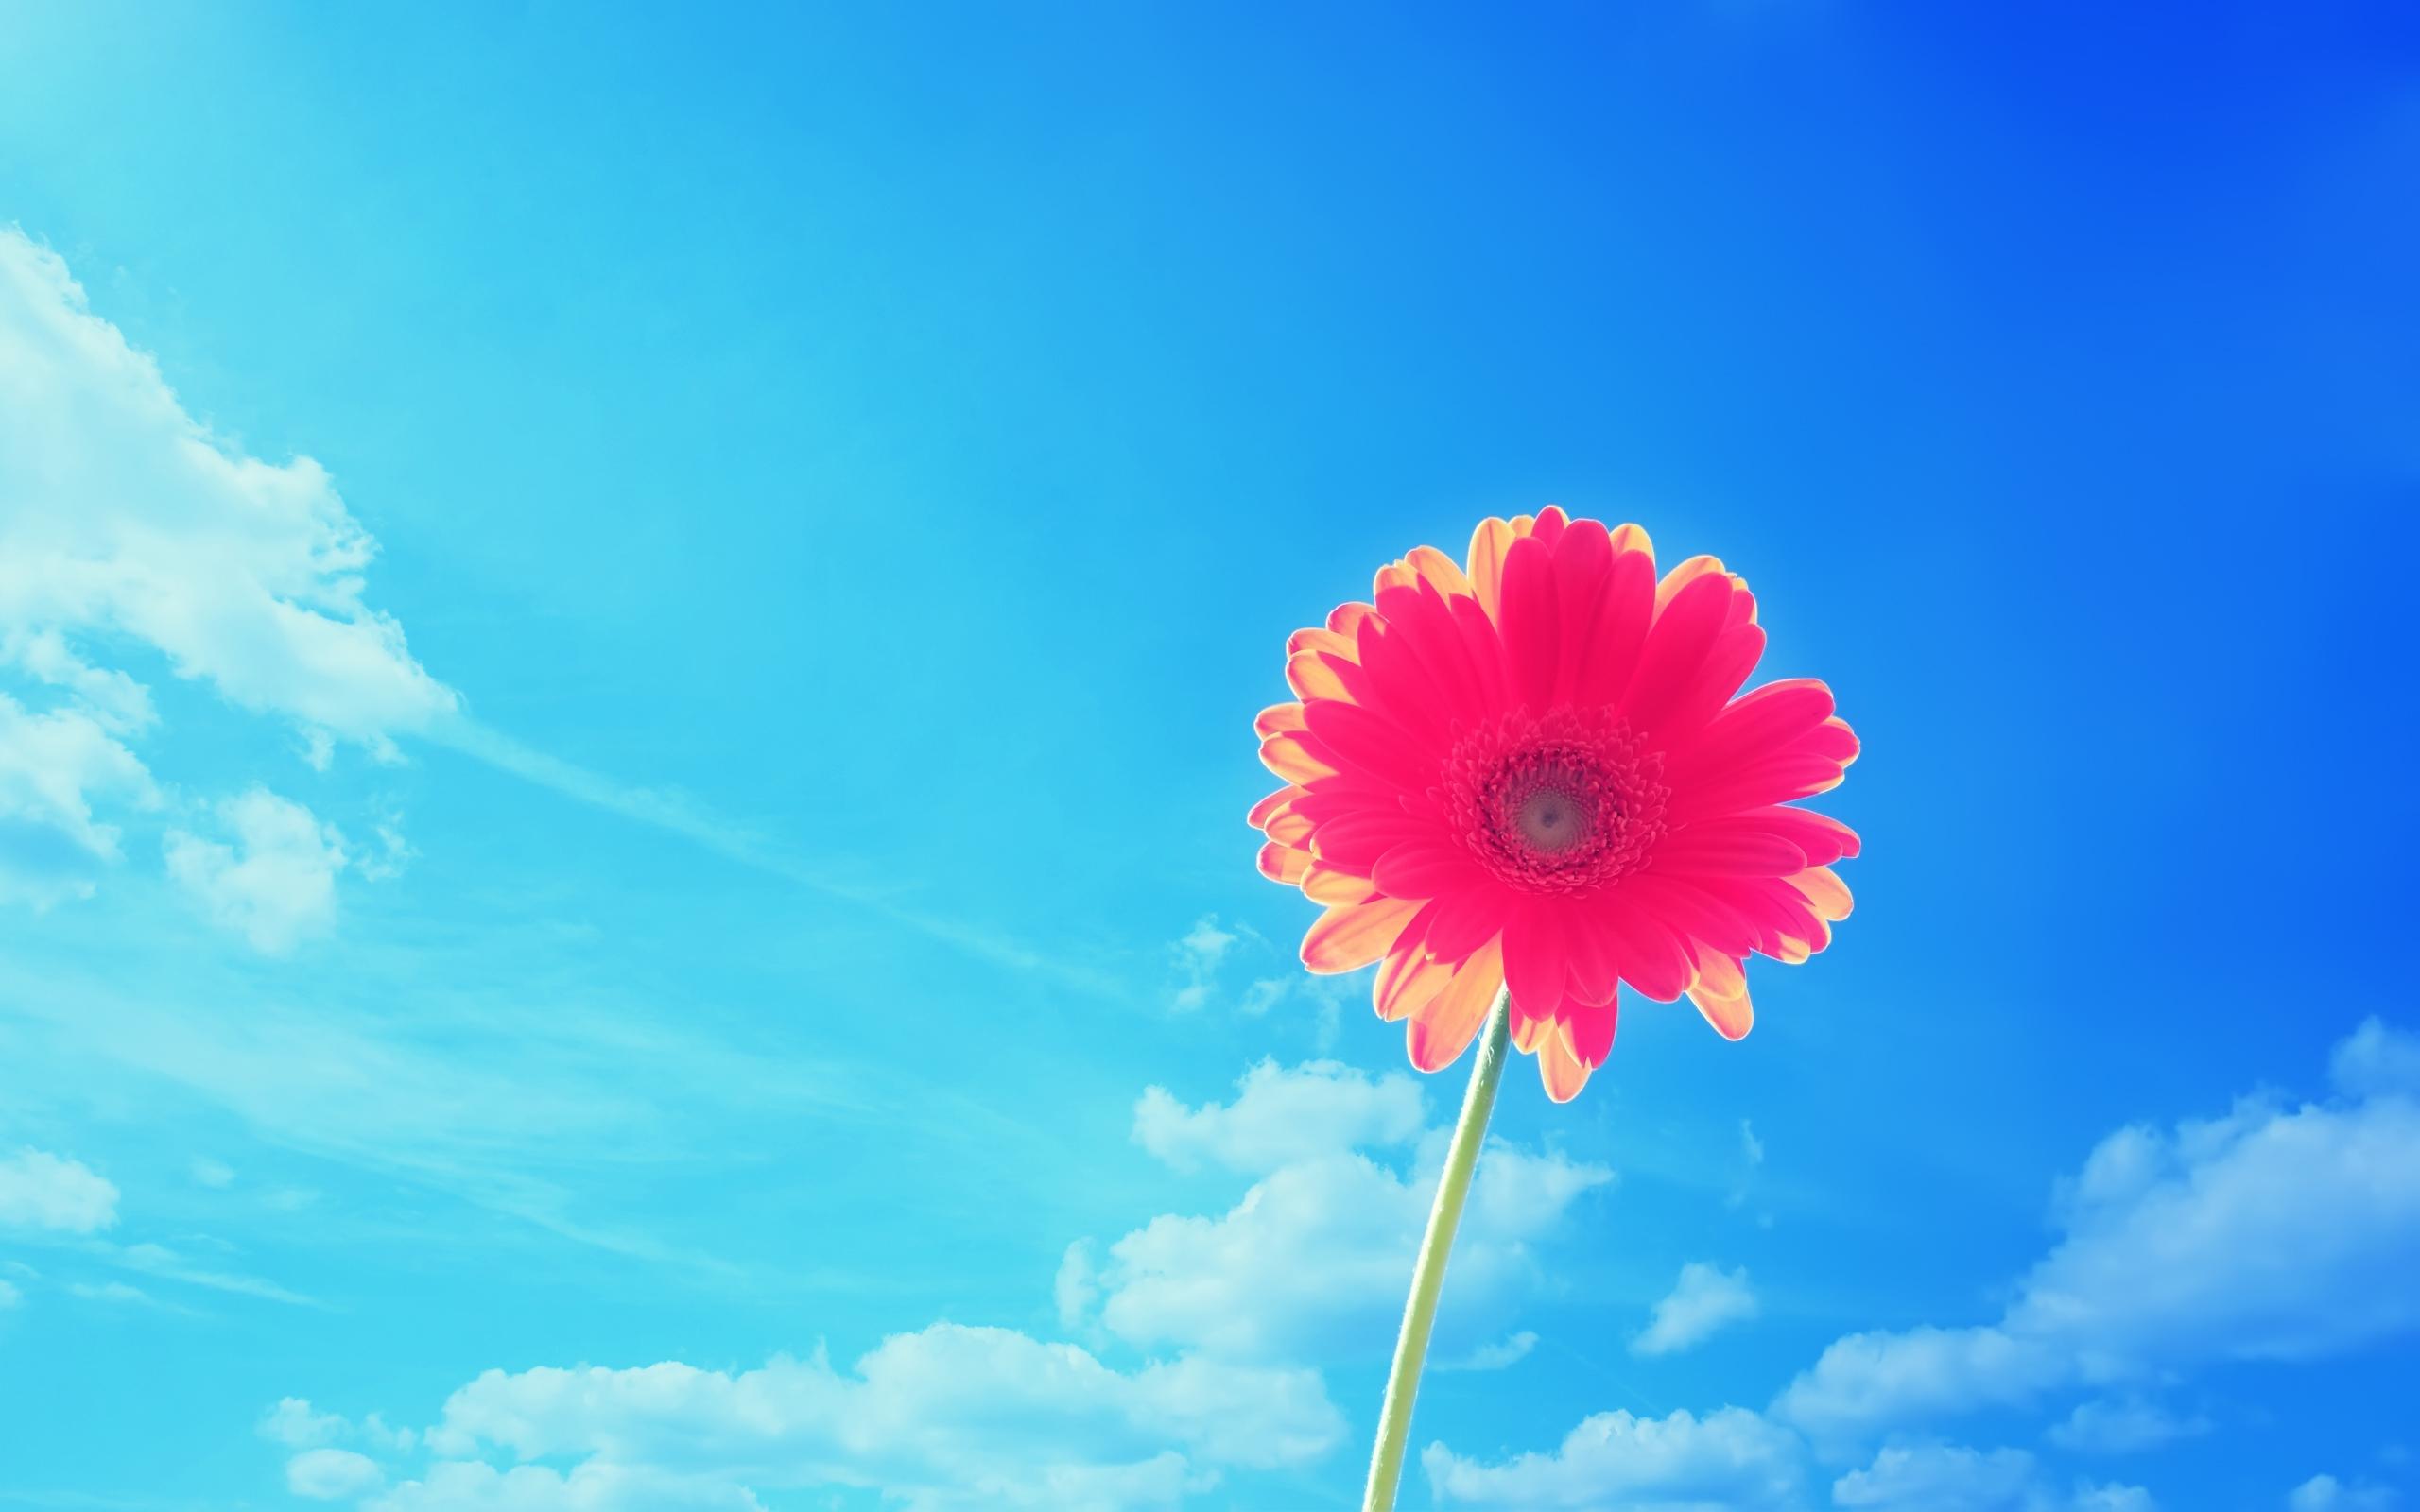 Pink Gerbera Flower Wallpapers HD Wallpapers 2560x1600